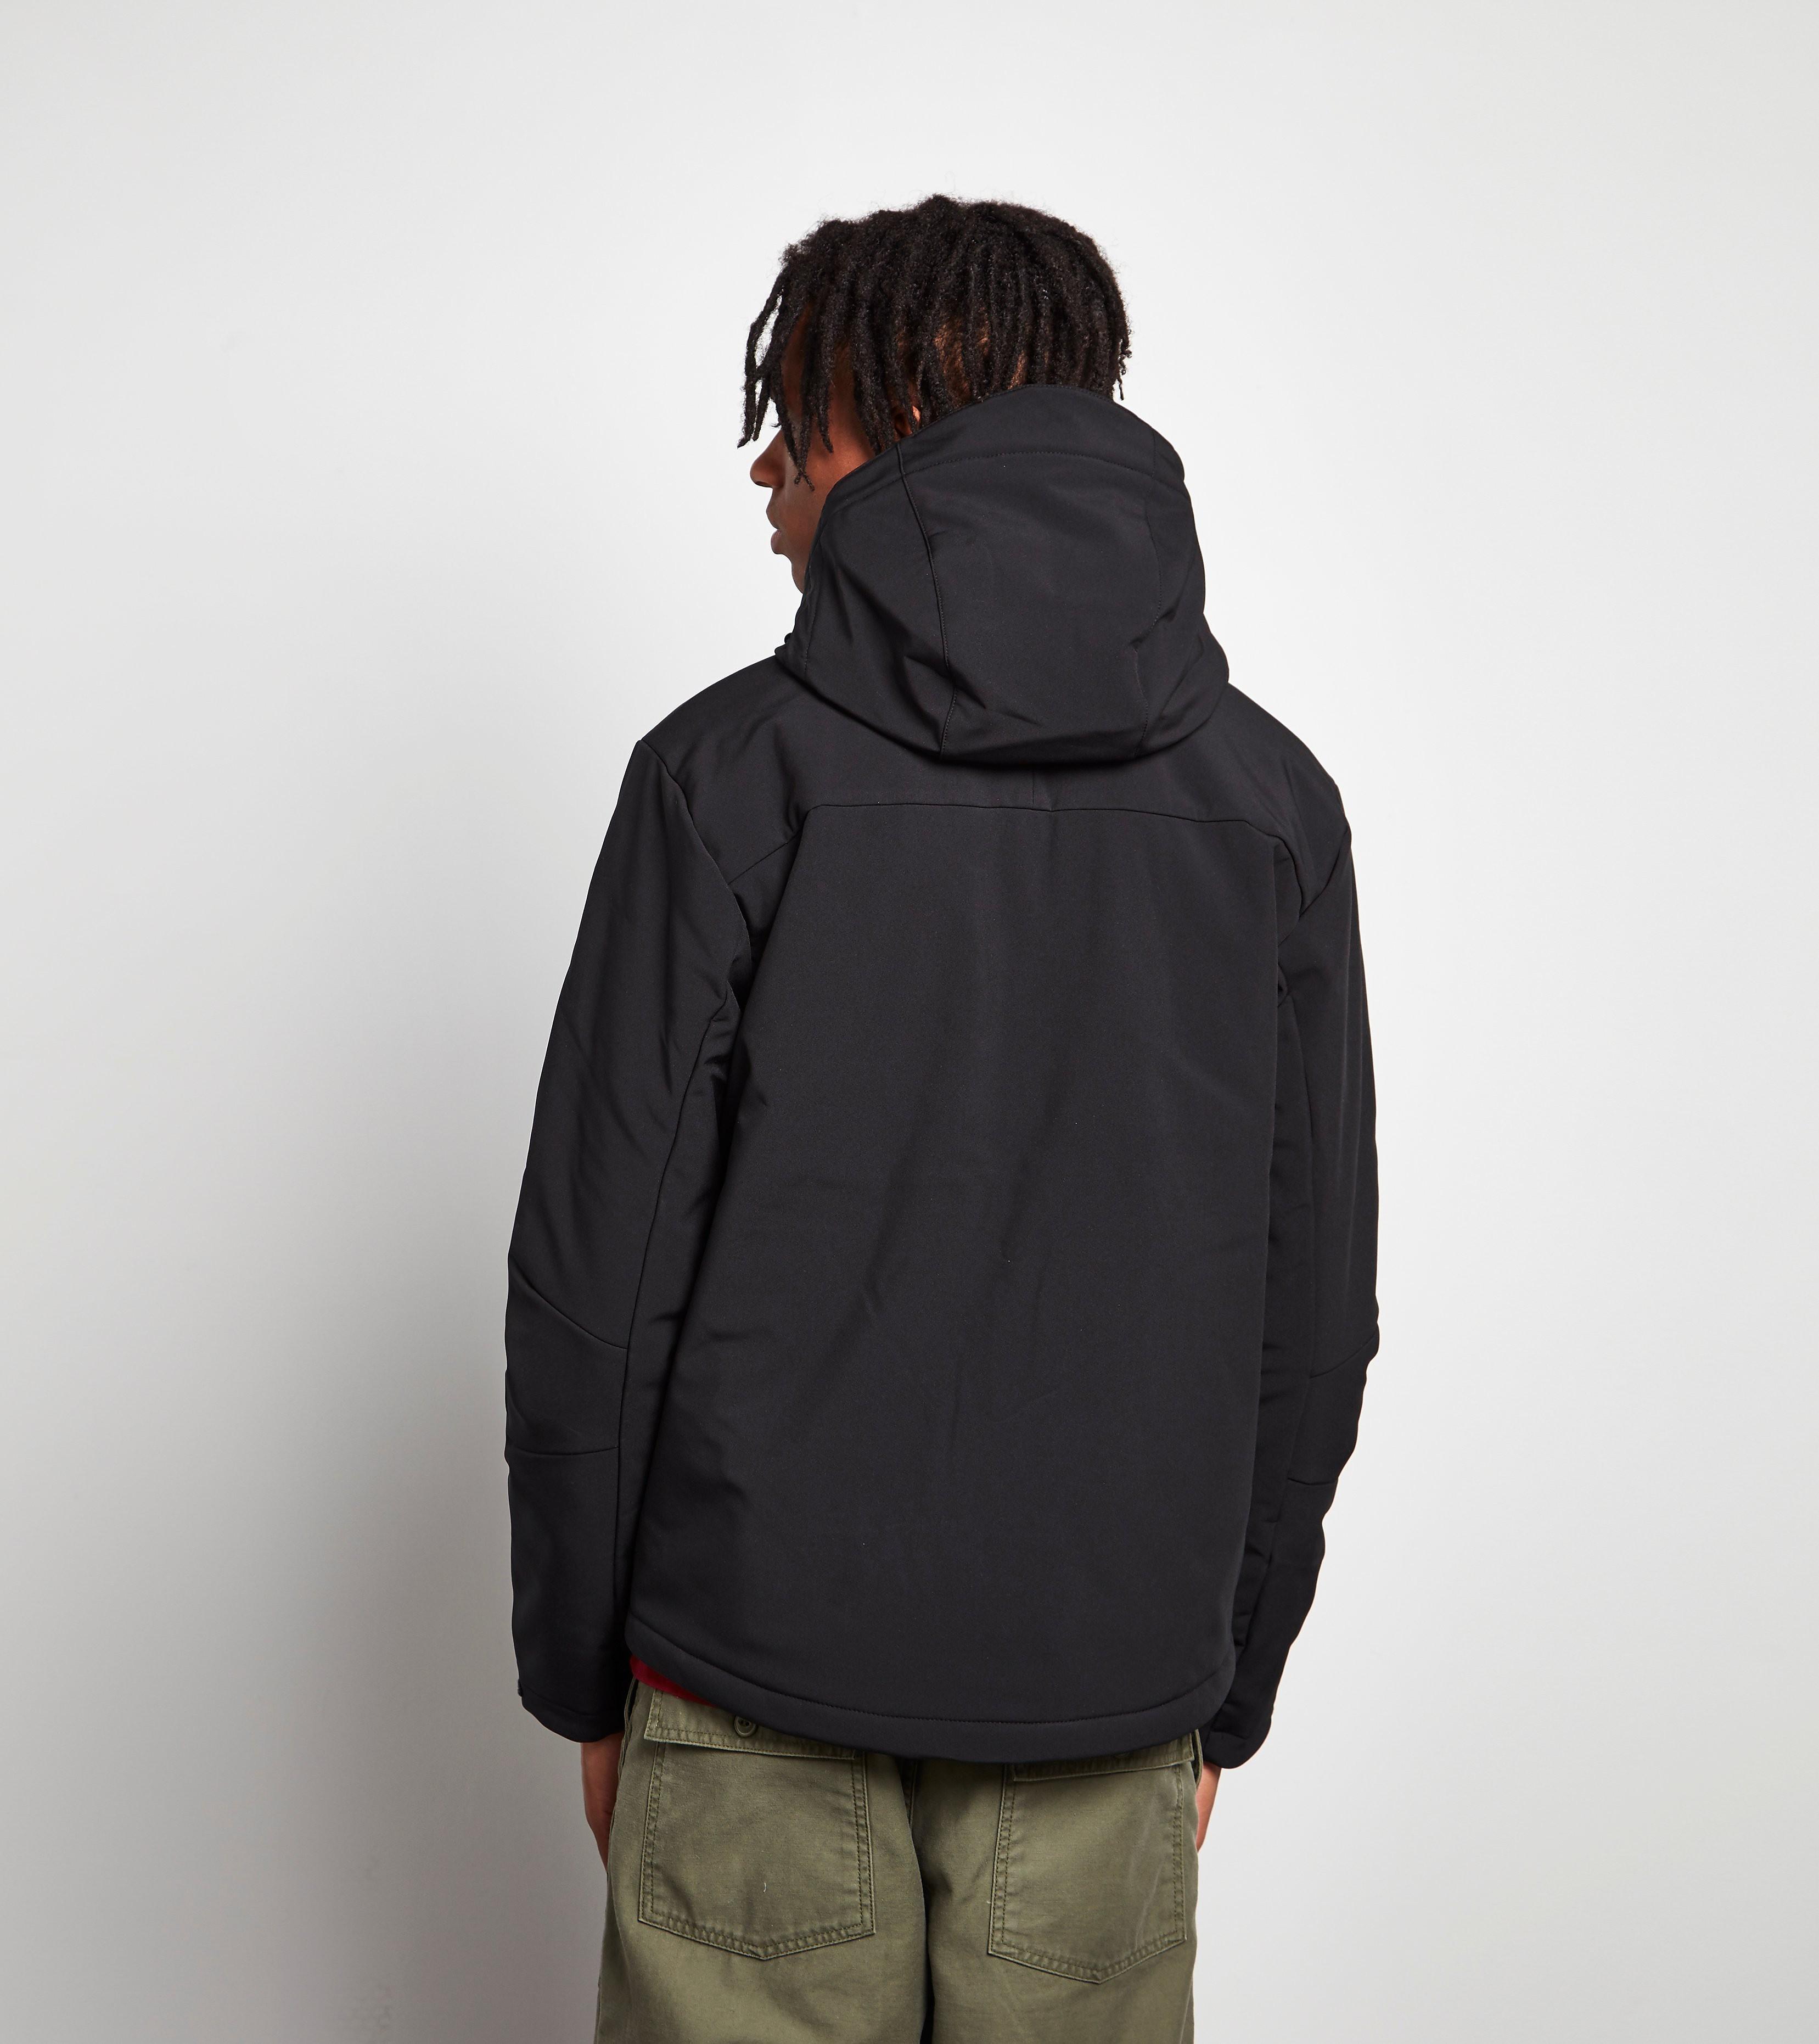 Helly Hansen Paramount Insulated Softshell Jacket